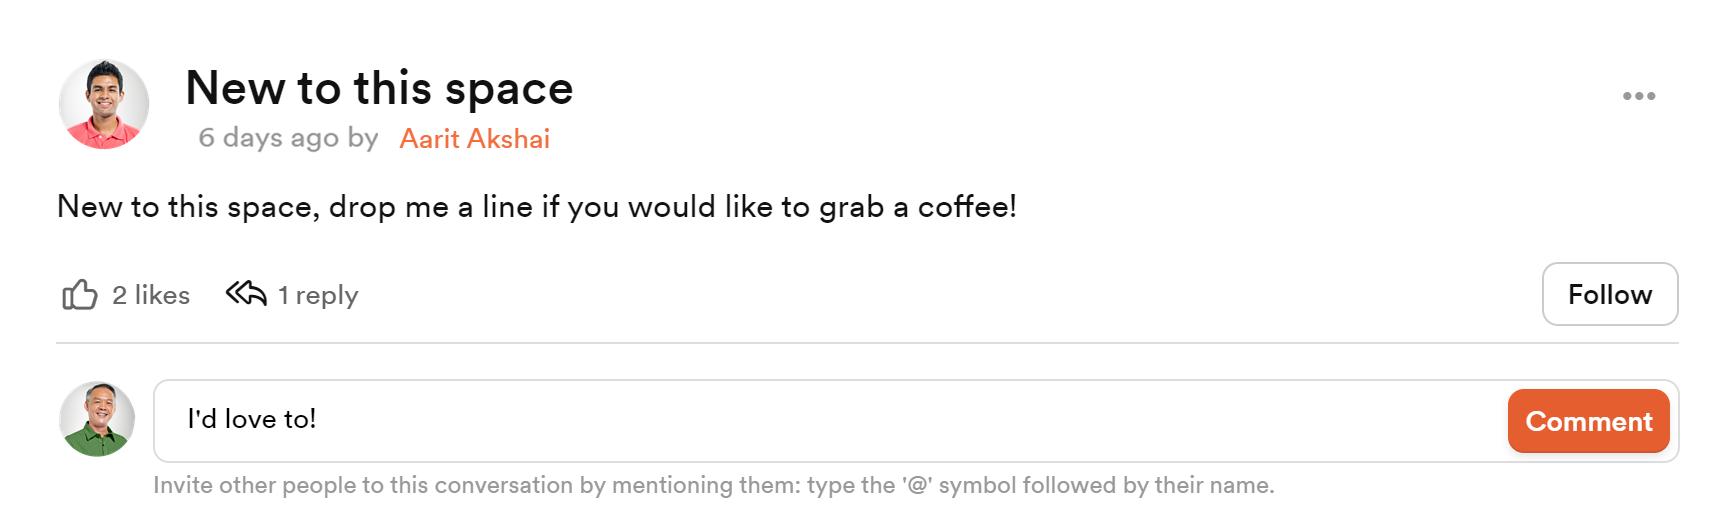 new members' portal leave a comment screenshot